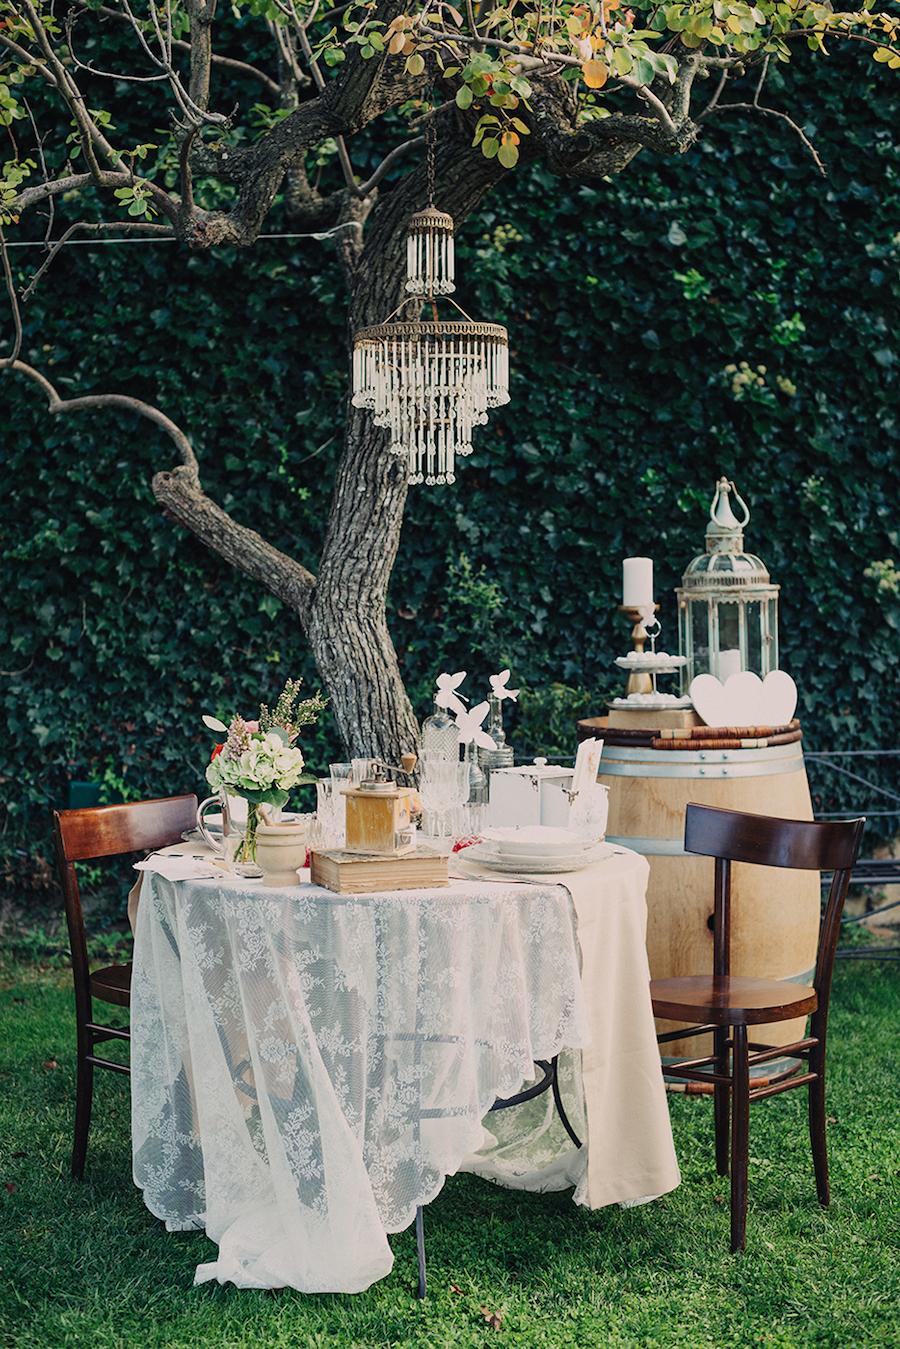 matrimonio-bucolico-boho-chic-gradisca-portento-wedding-wonderland-09